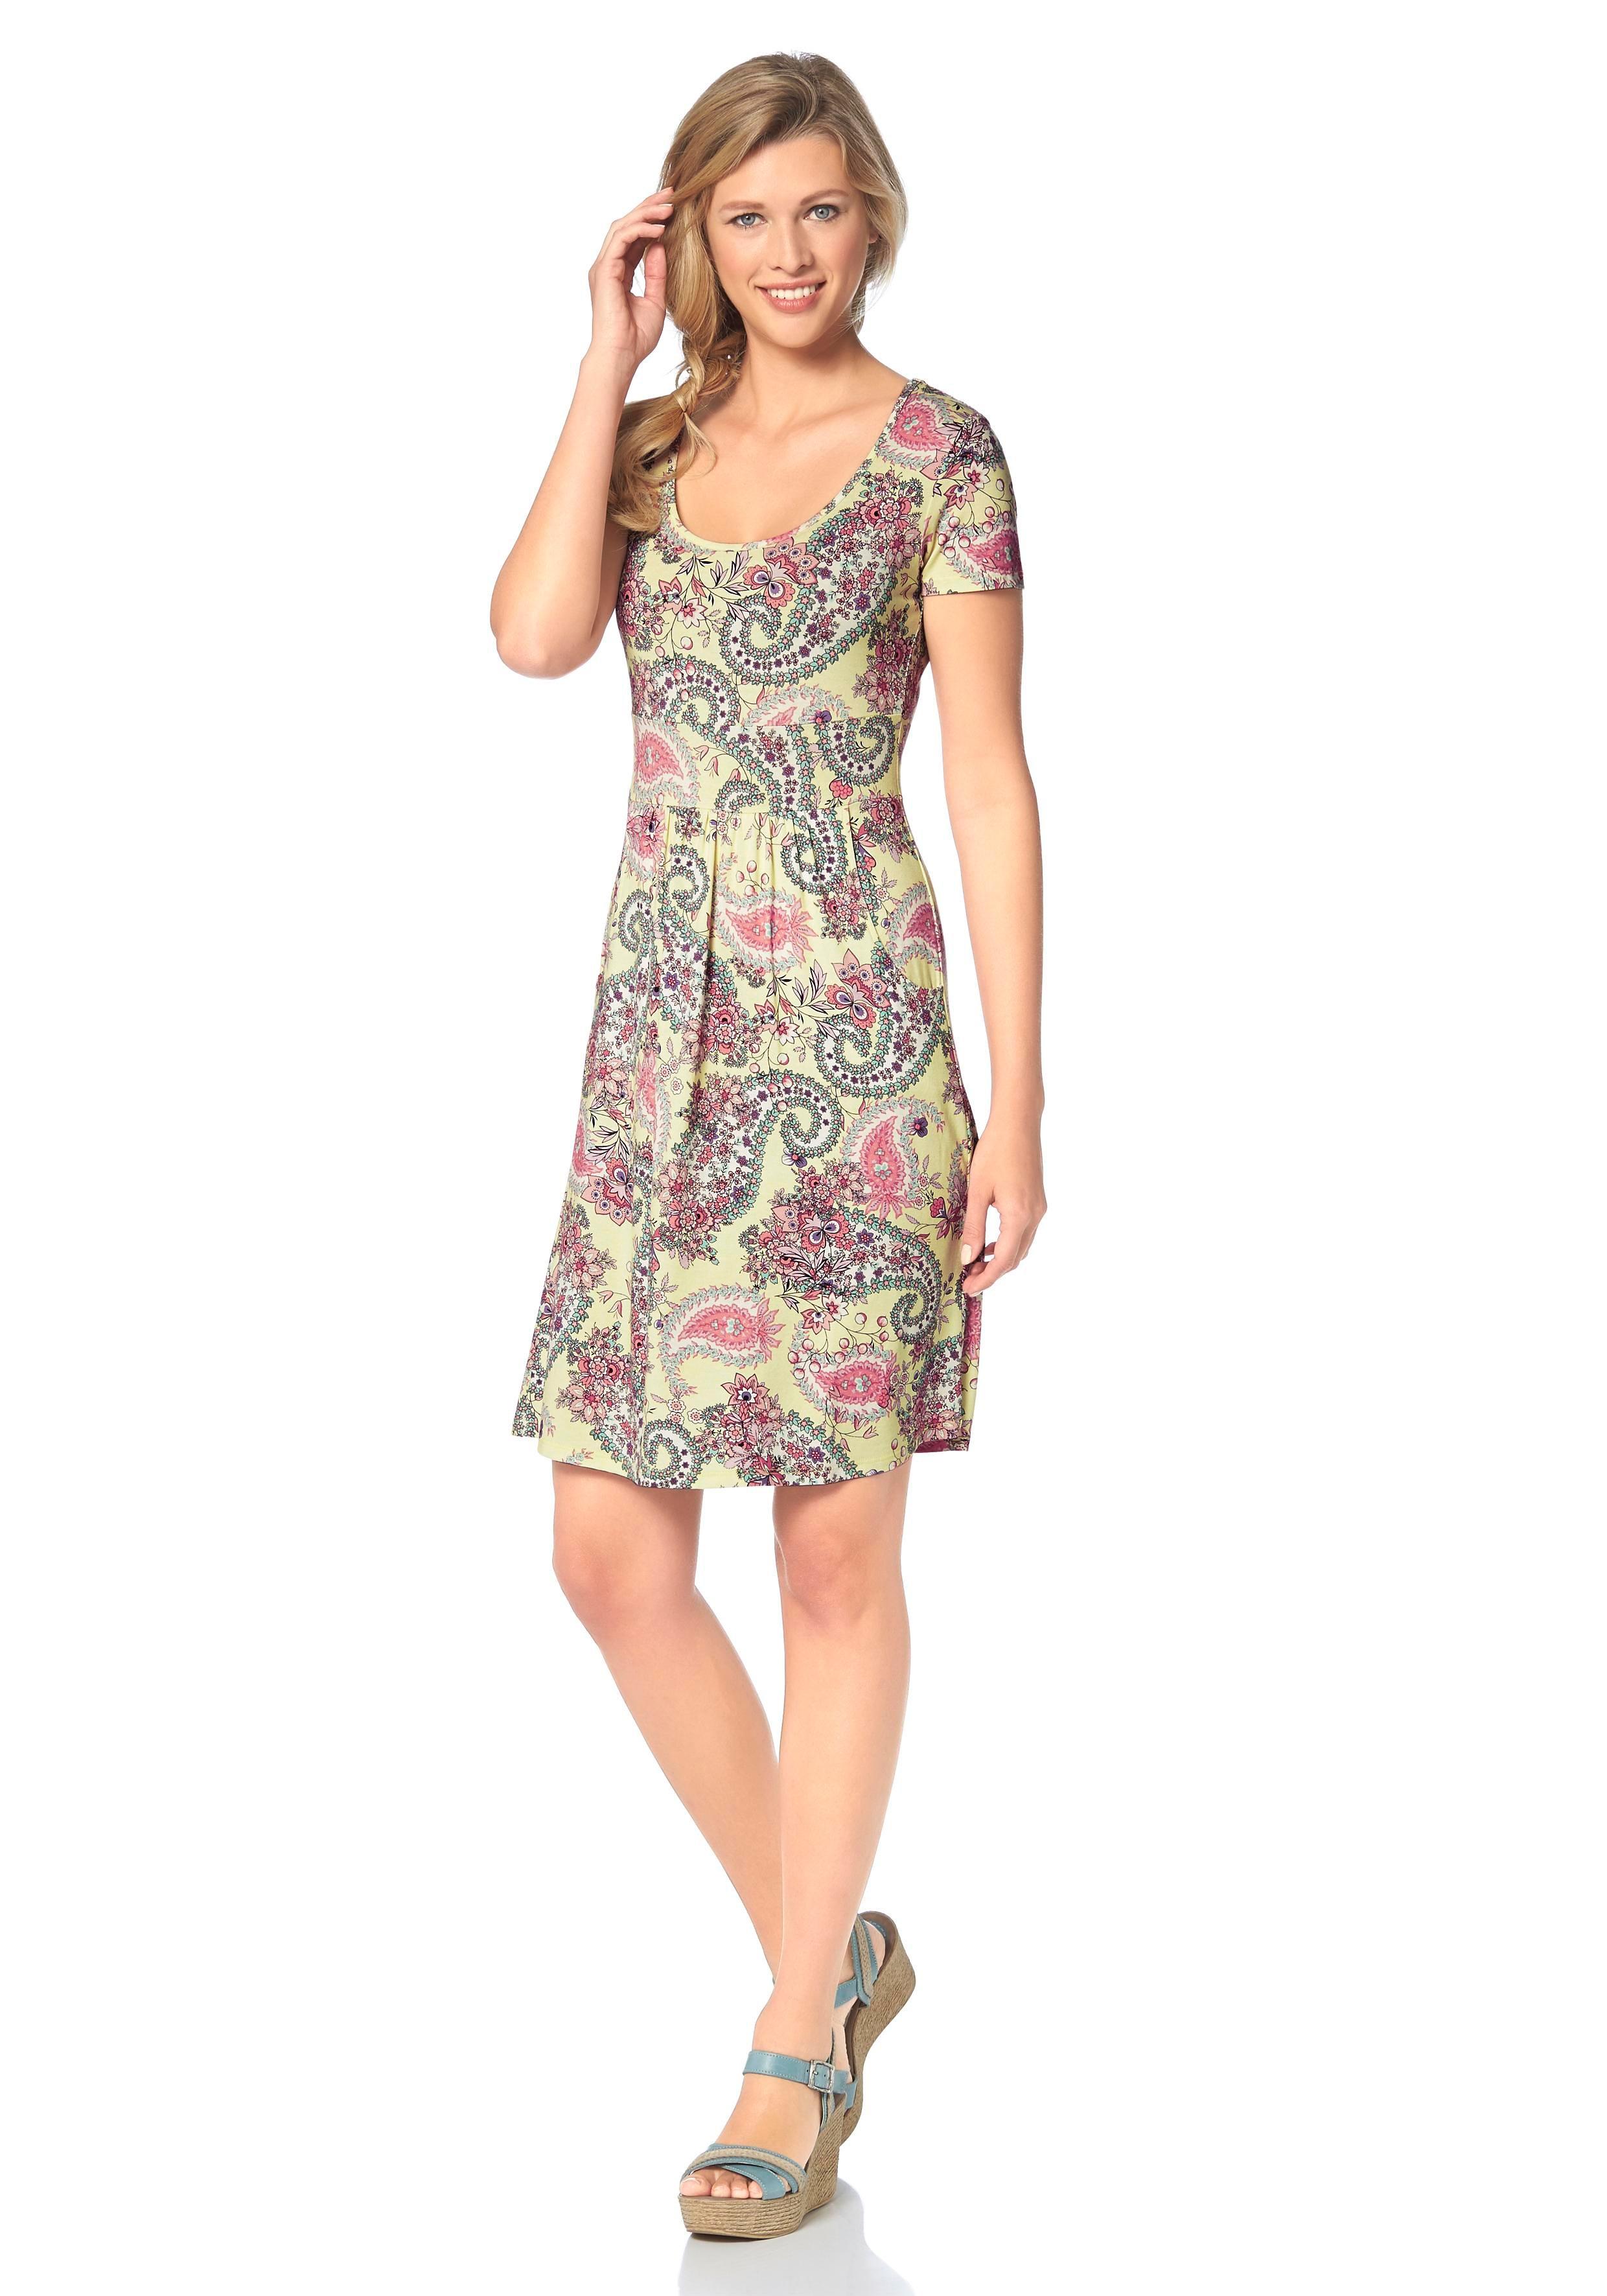 48e16401fed782 Afbeeldingsbron  CHEER Jersey-jurk met zakken opzij